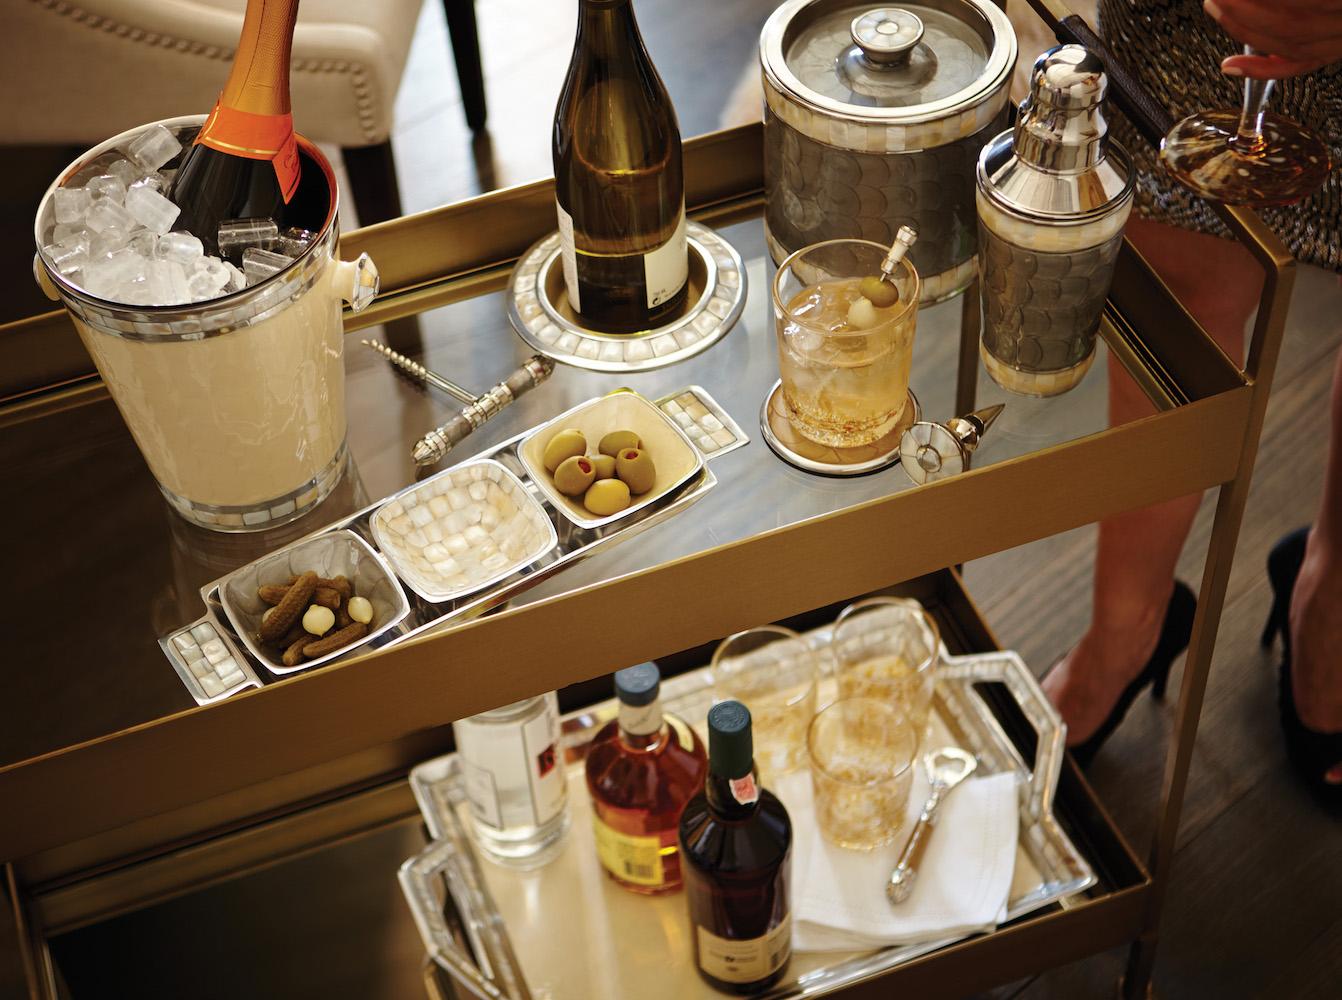 Luxury Hotel Serveware